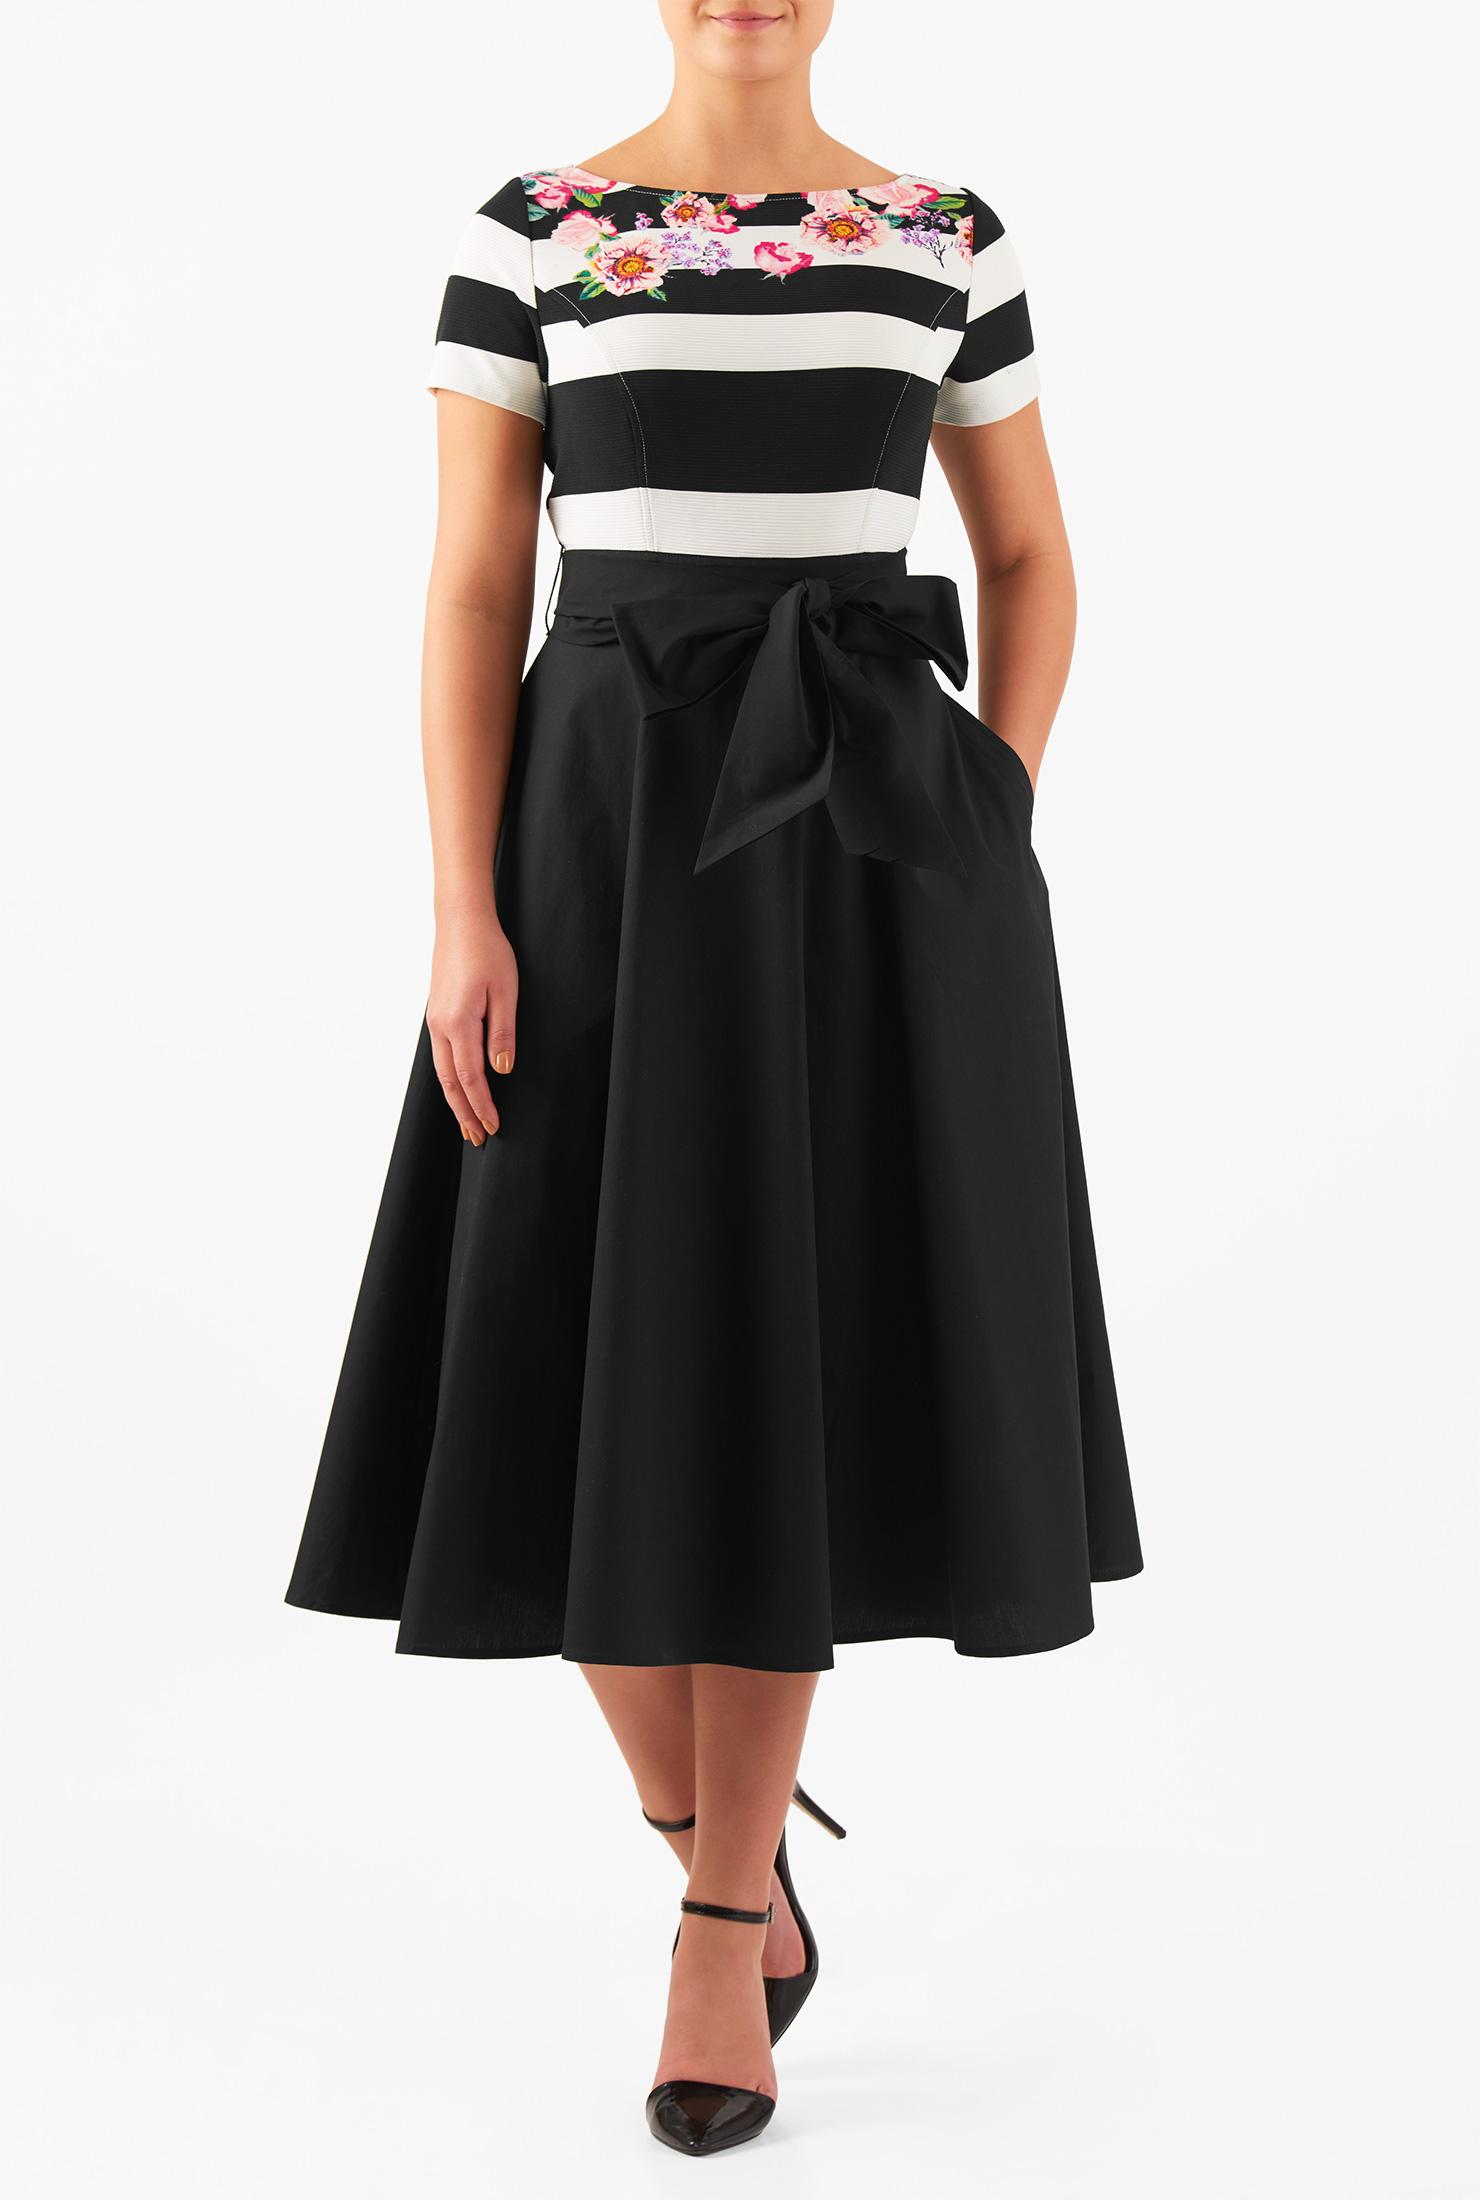 eShakti Women's Floral stripe rib knit mixed media midi dress CL0046904